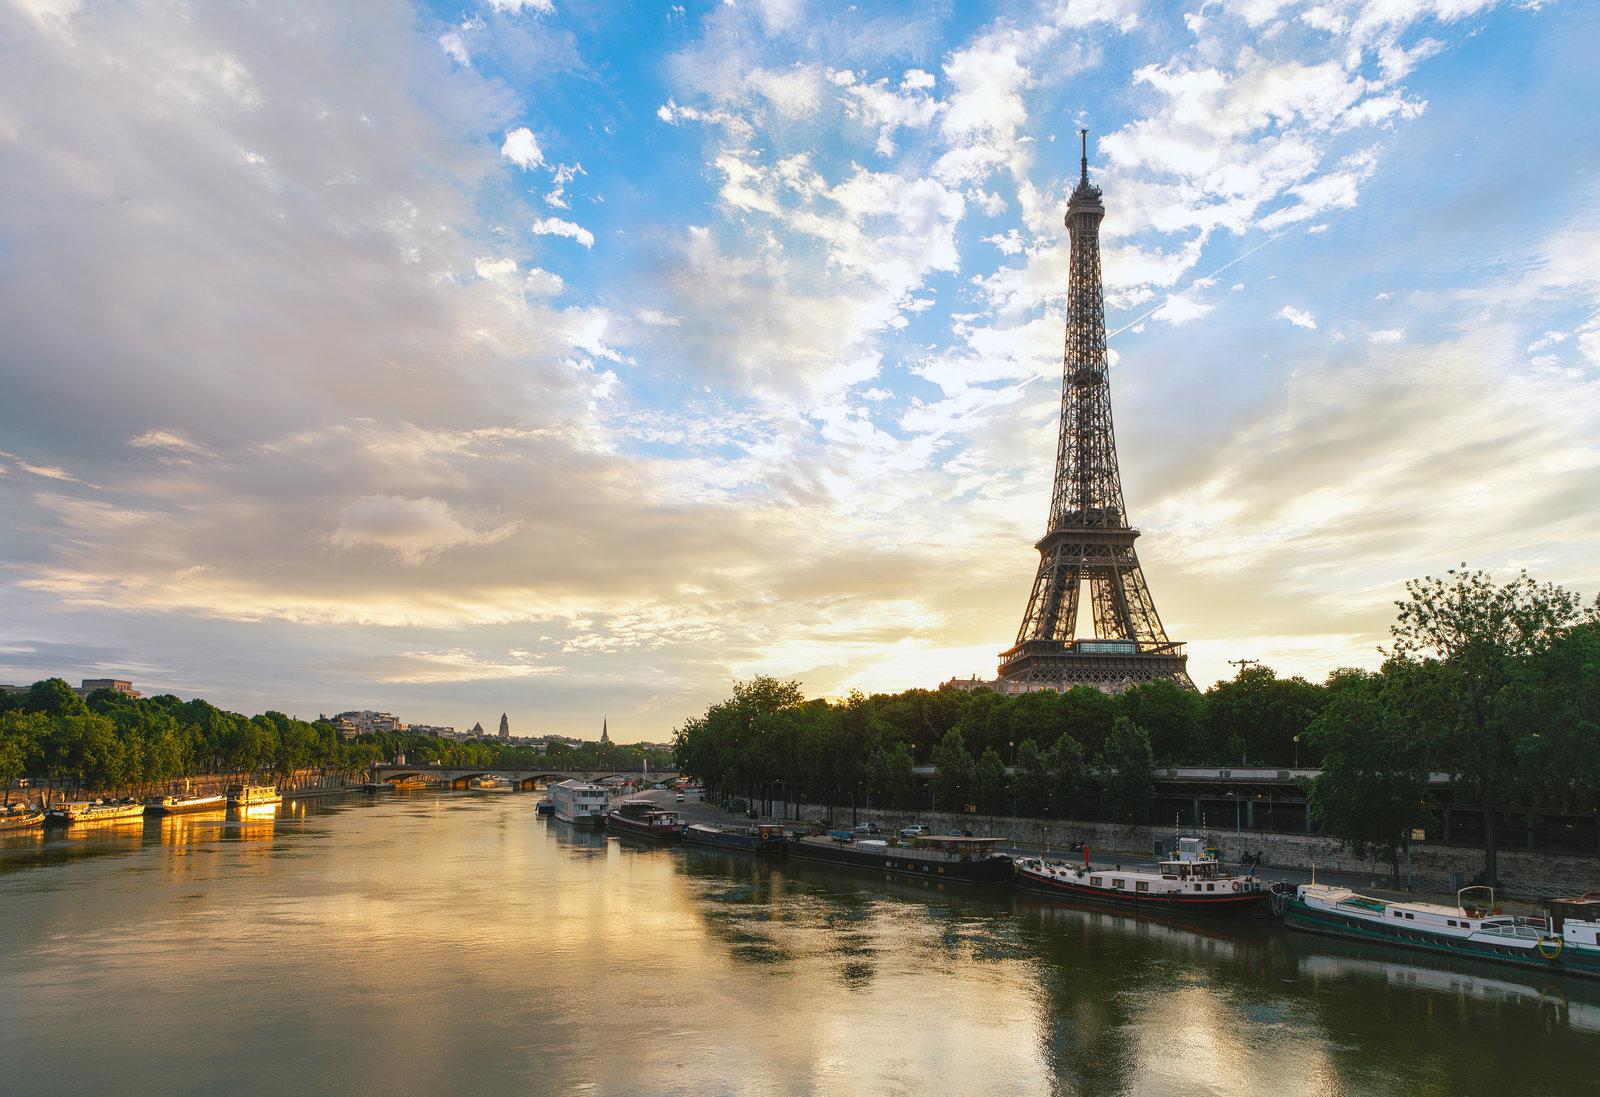 29 Fondos de pantalla de París, Wallpapers HD 2020